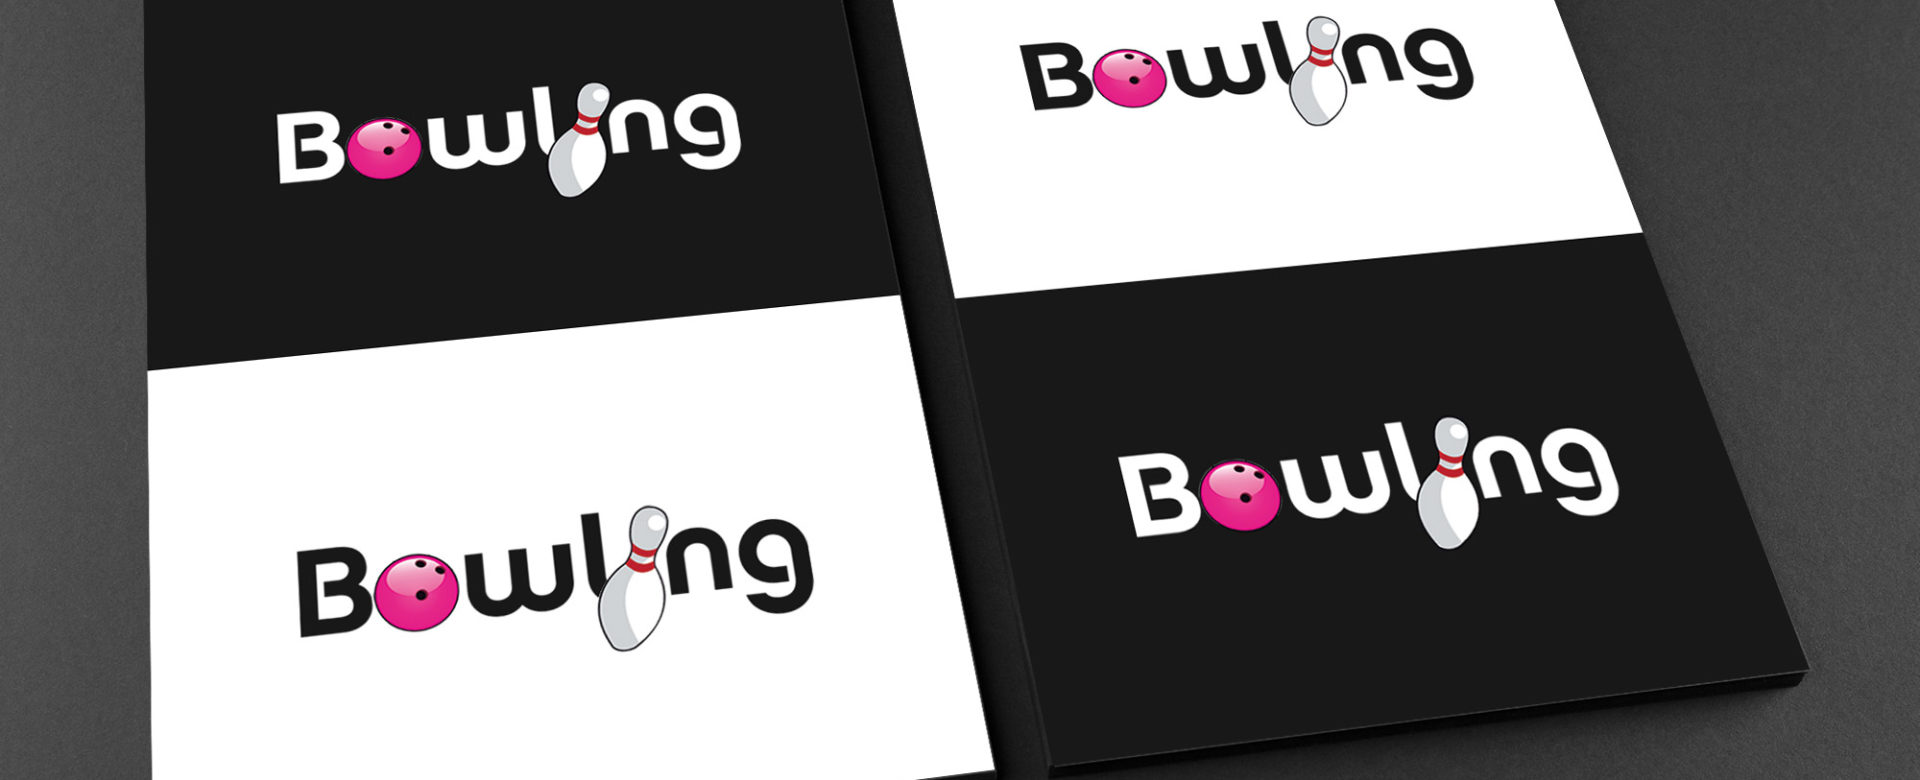 bowling-furiani-corse-site-web-logo